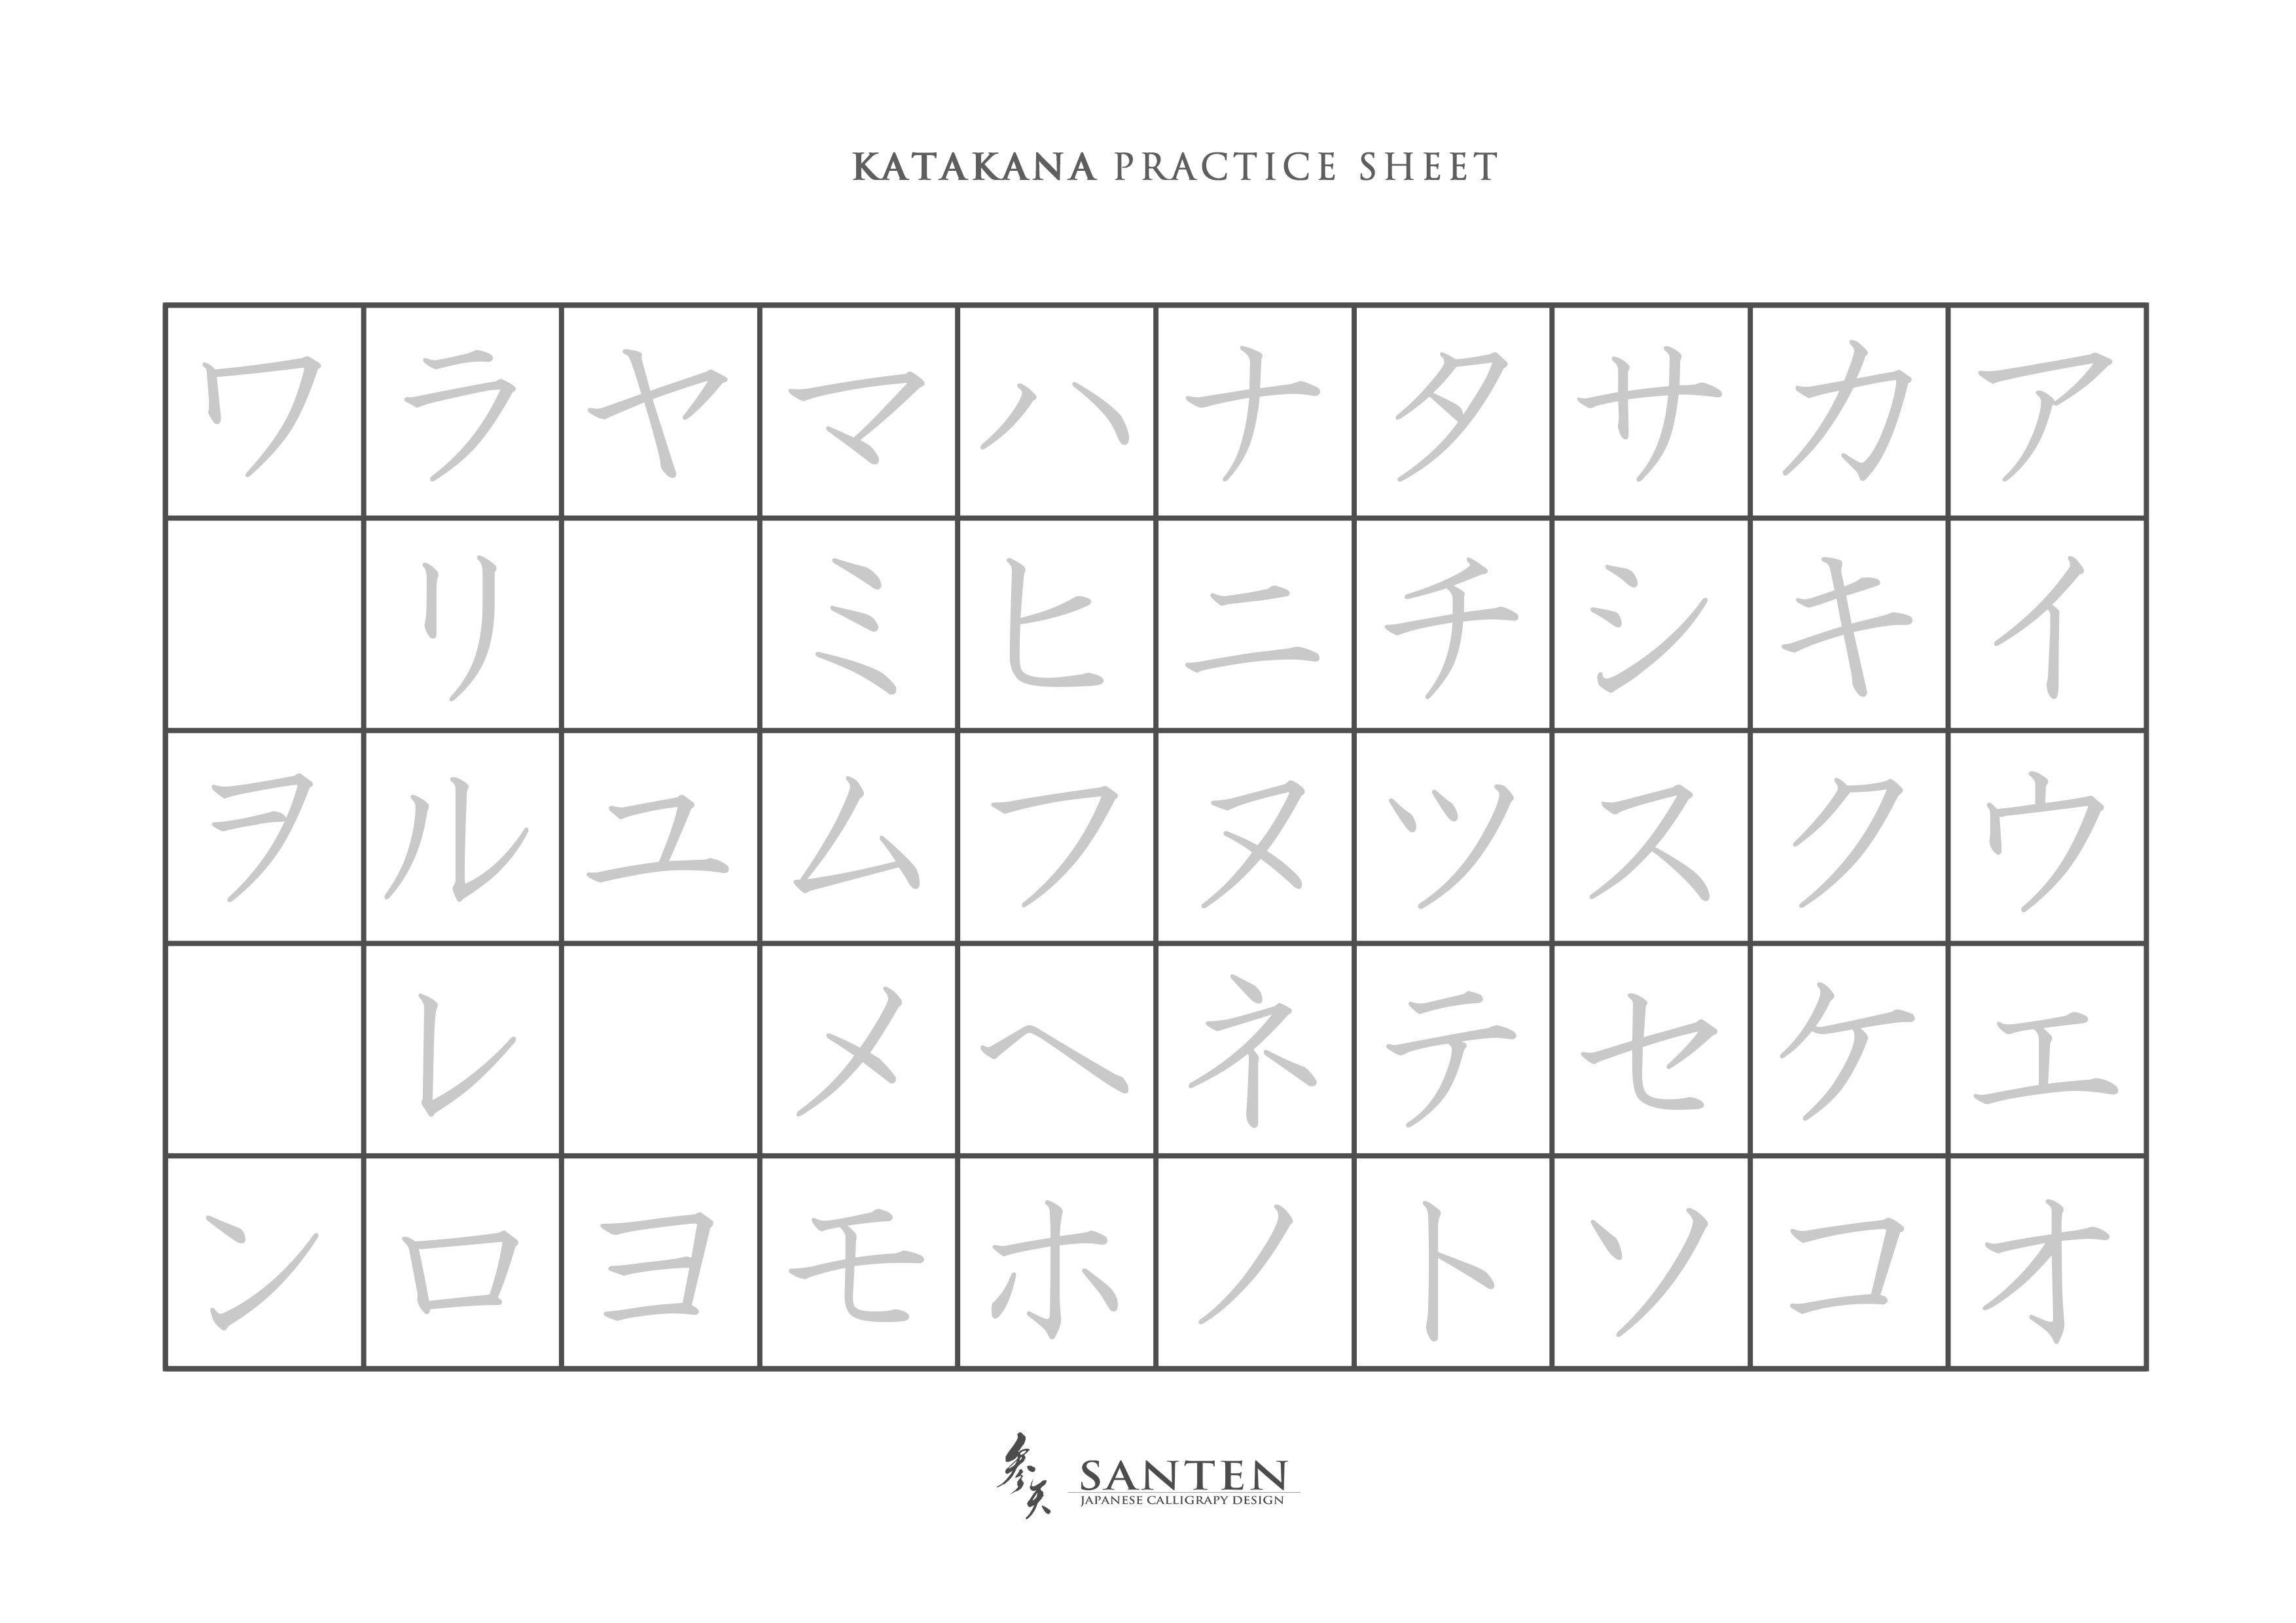 Japanese Katakana Practice Sheet How To Use Katakana